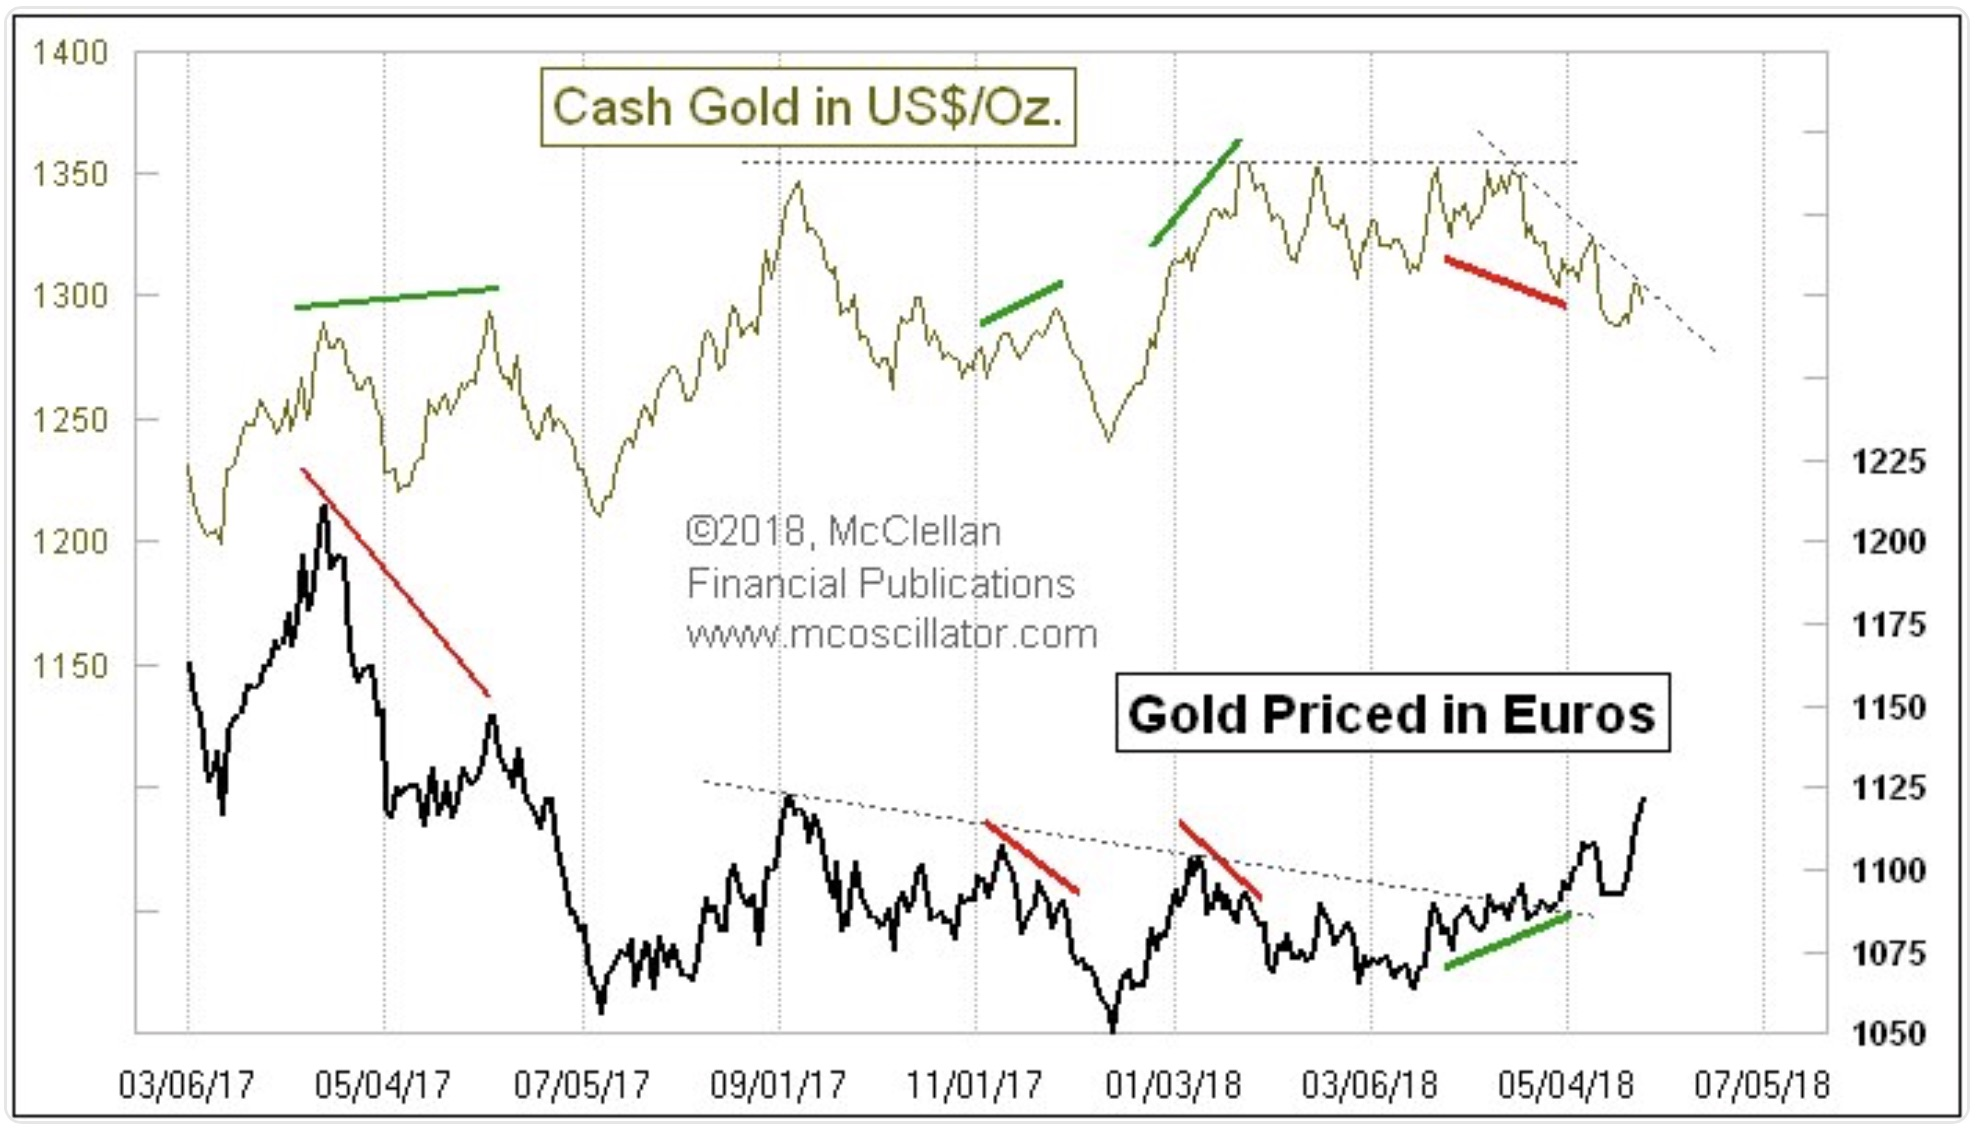 McClellan – Euro Gold Leading The Way! - Silver Gold Advisor